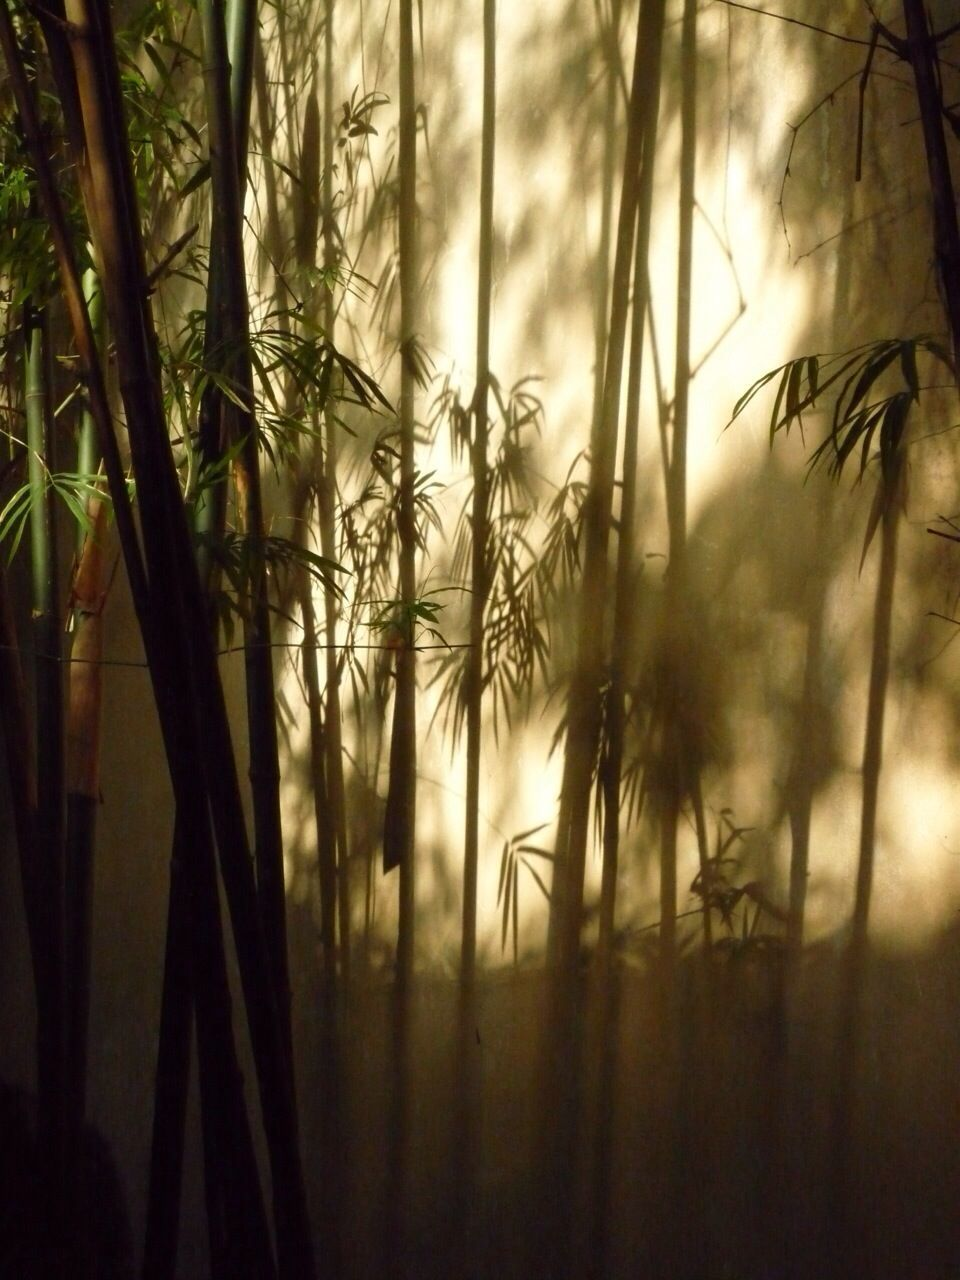 Shadow Of Plants